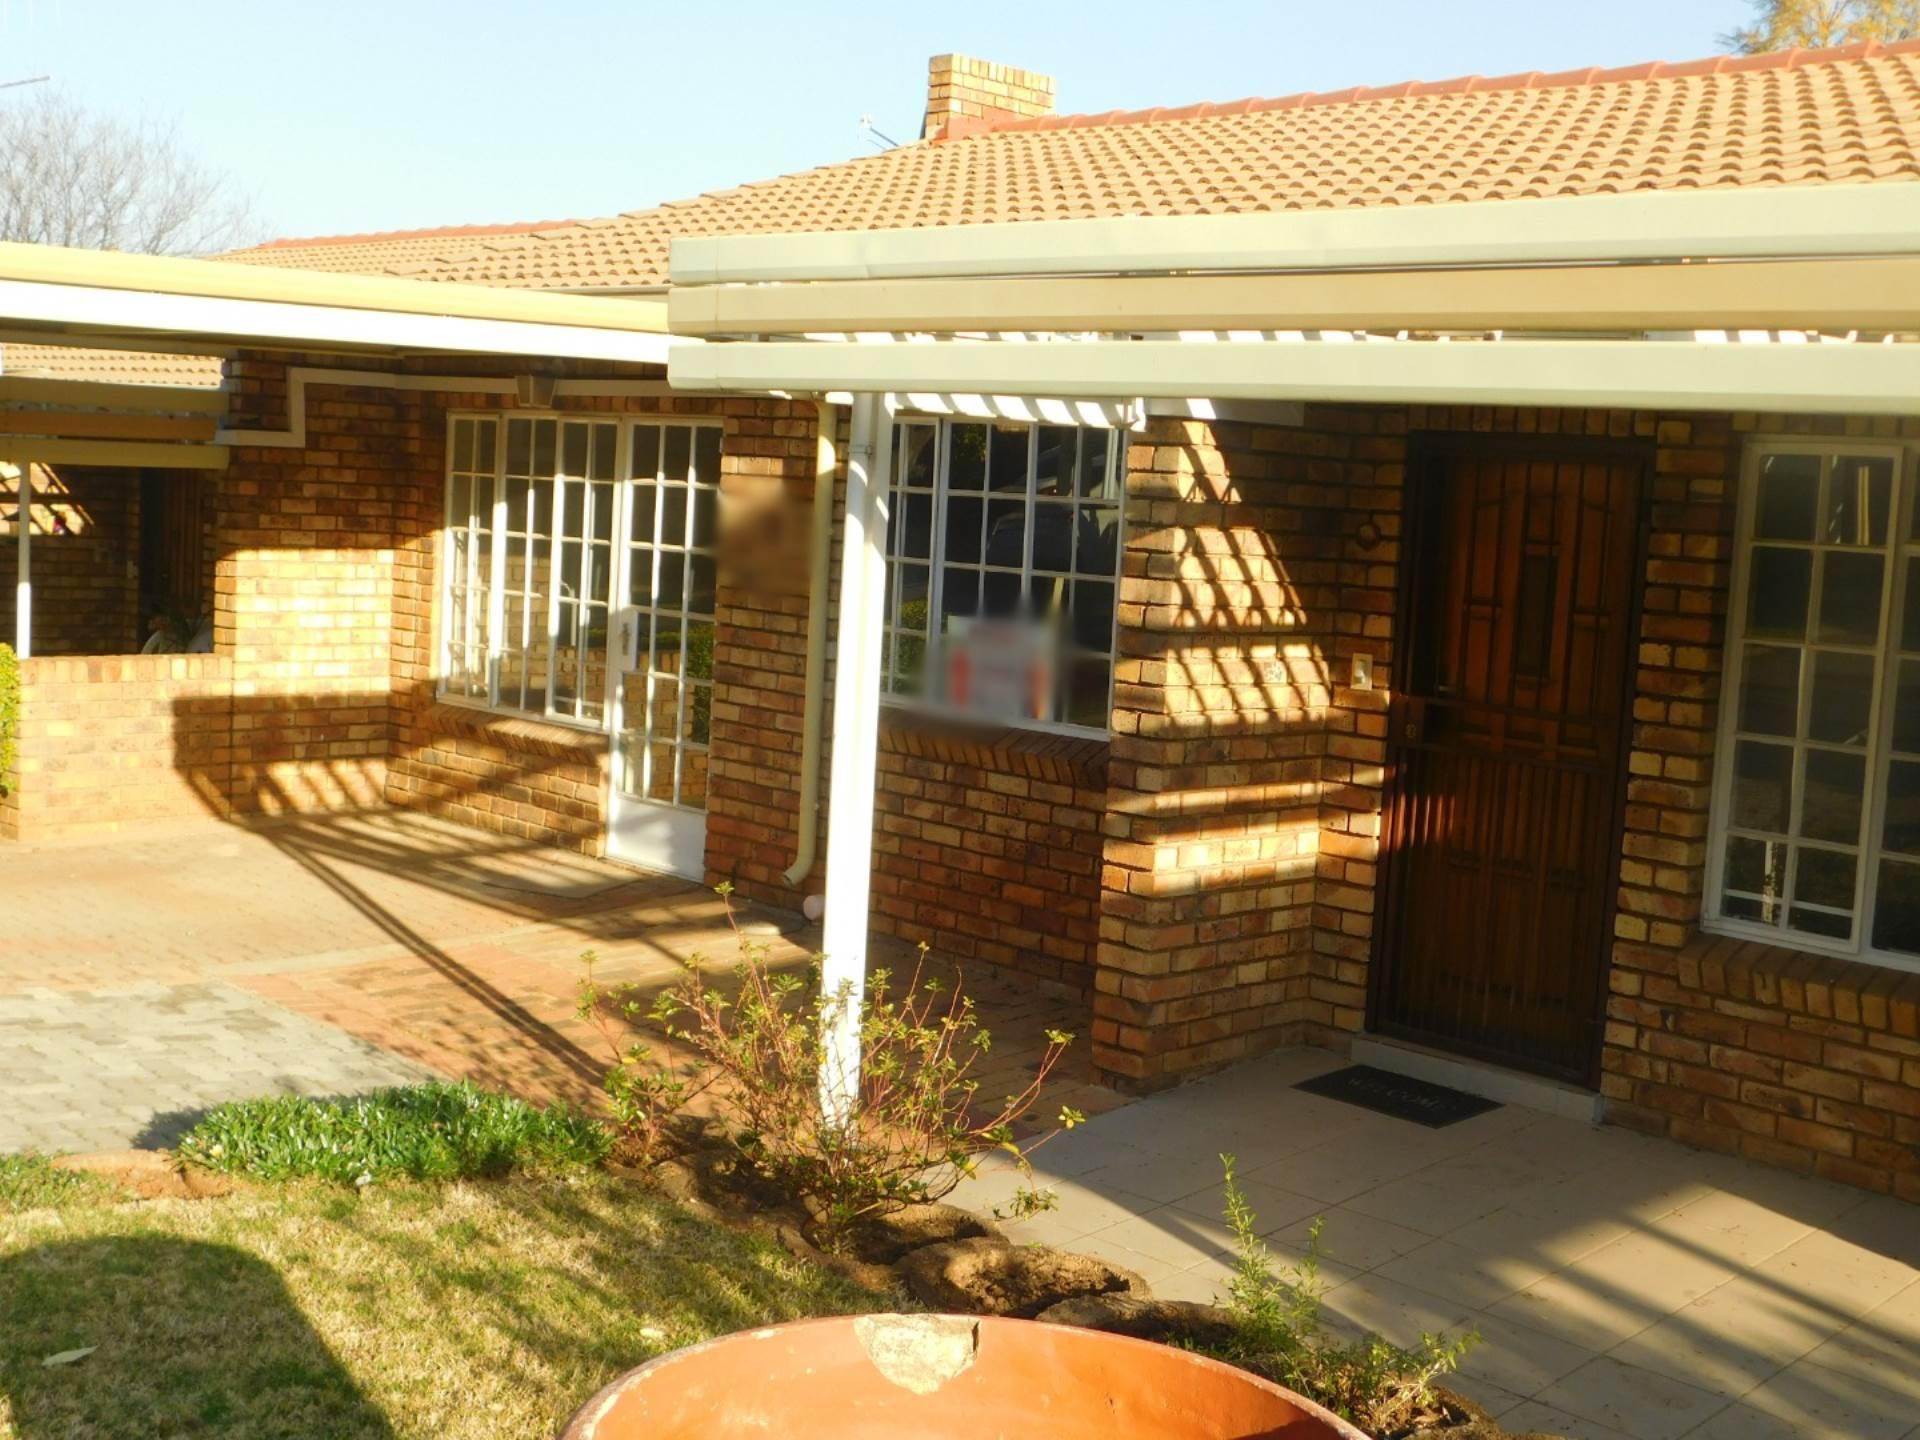 Retirement Village For Sale In Brummeria, Pretoria, Gauteng for R